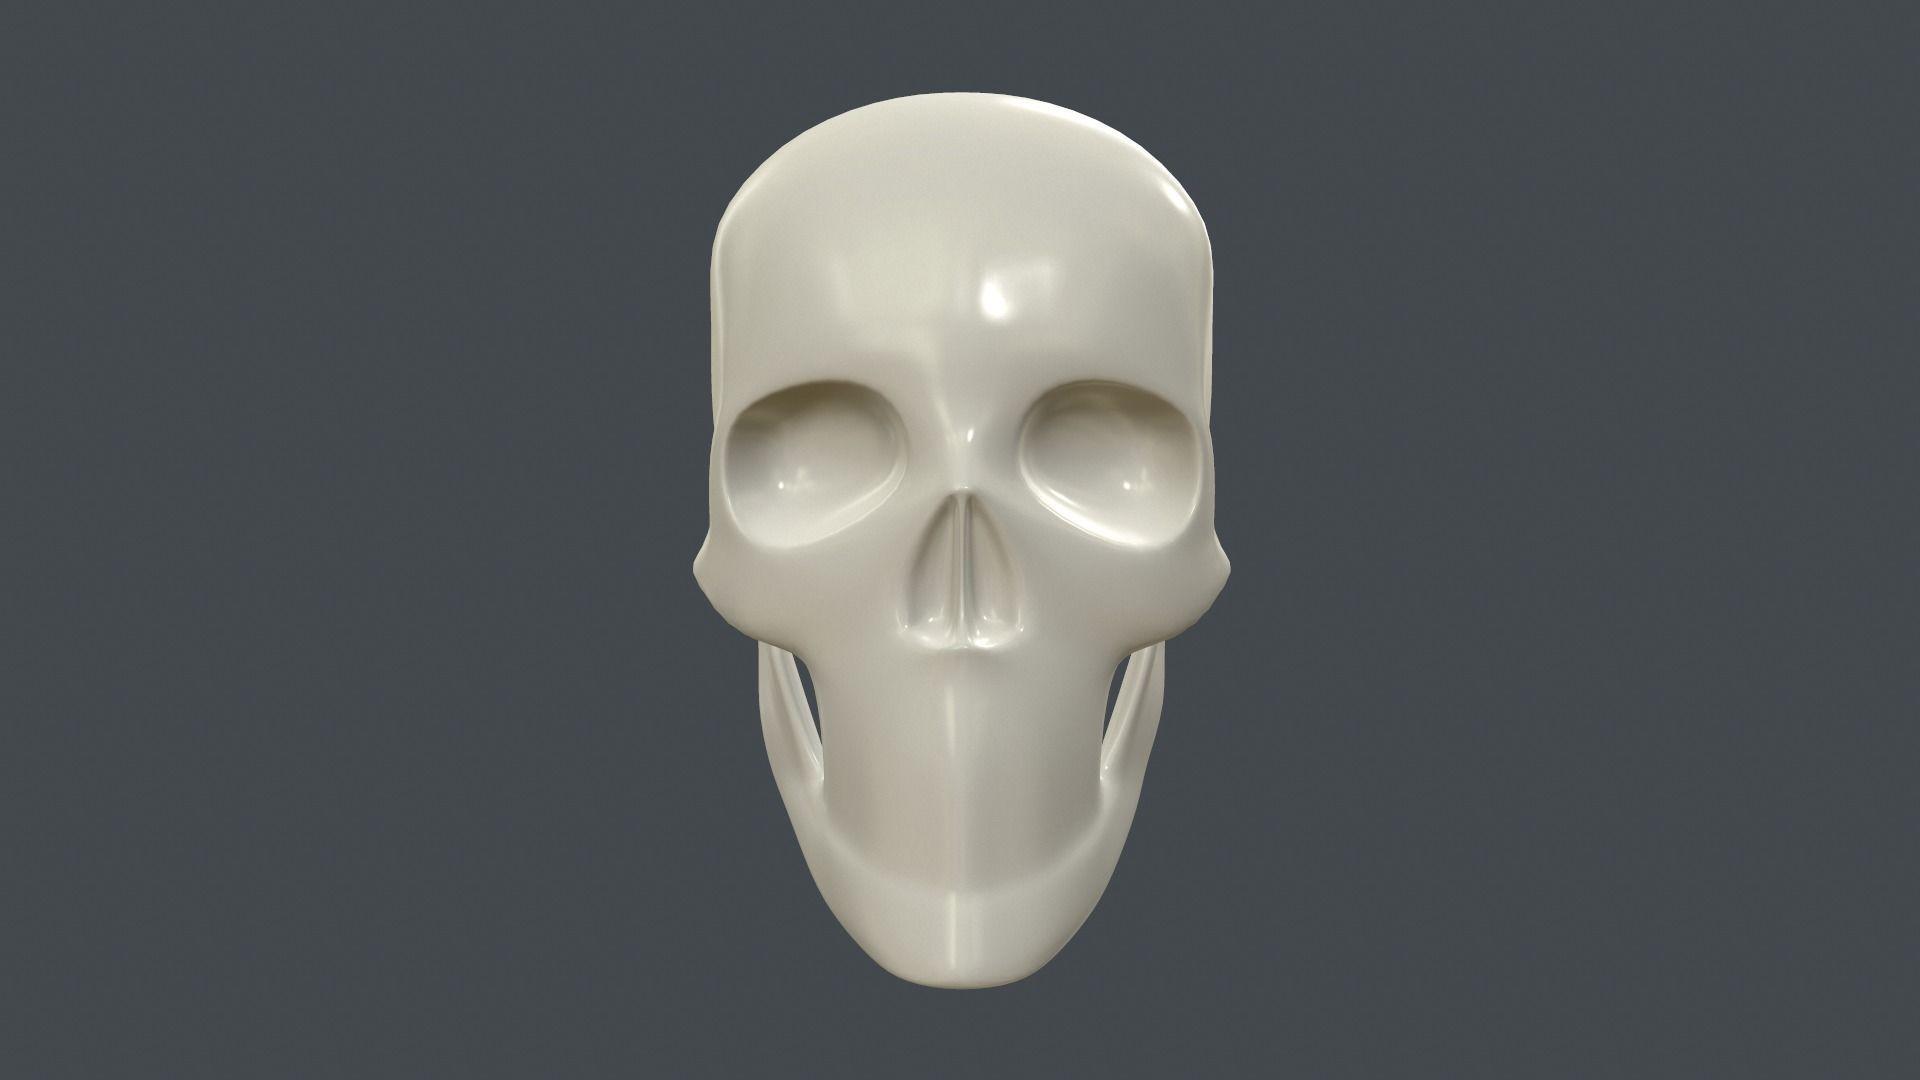 Stylized 3D model of a human skull